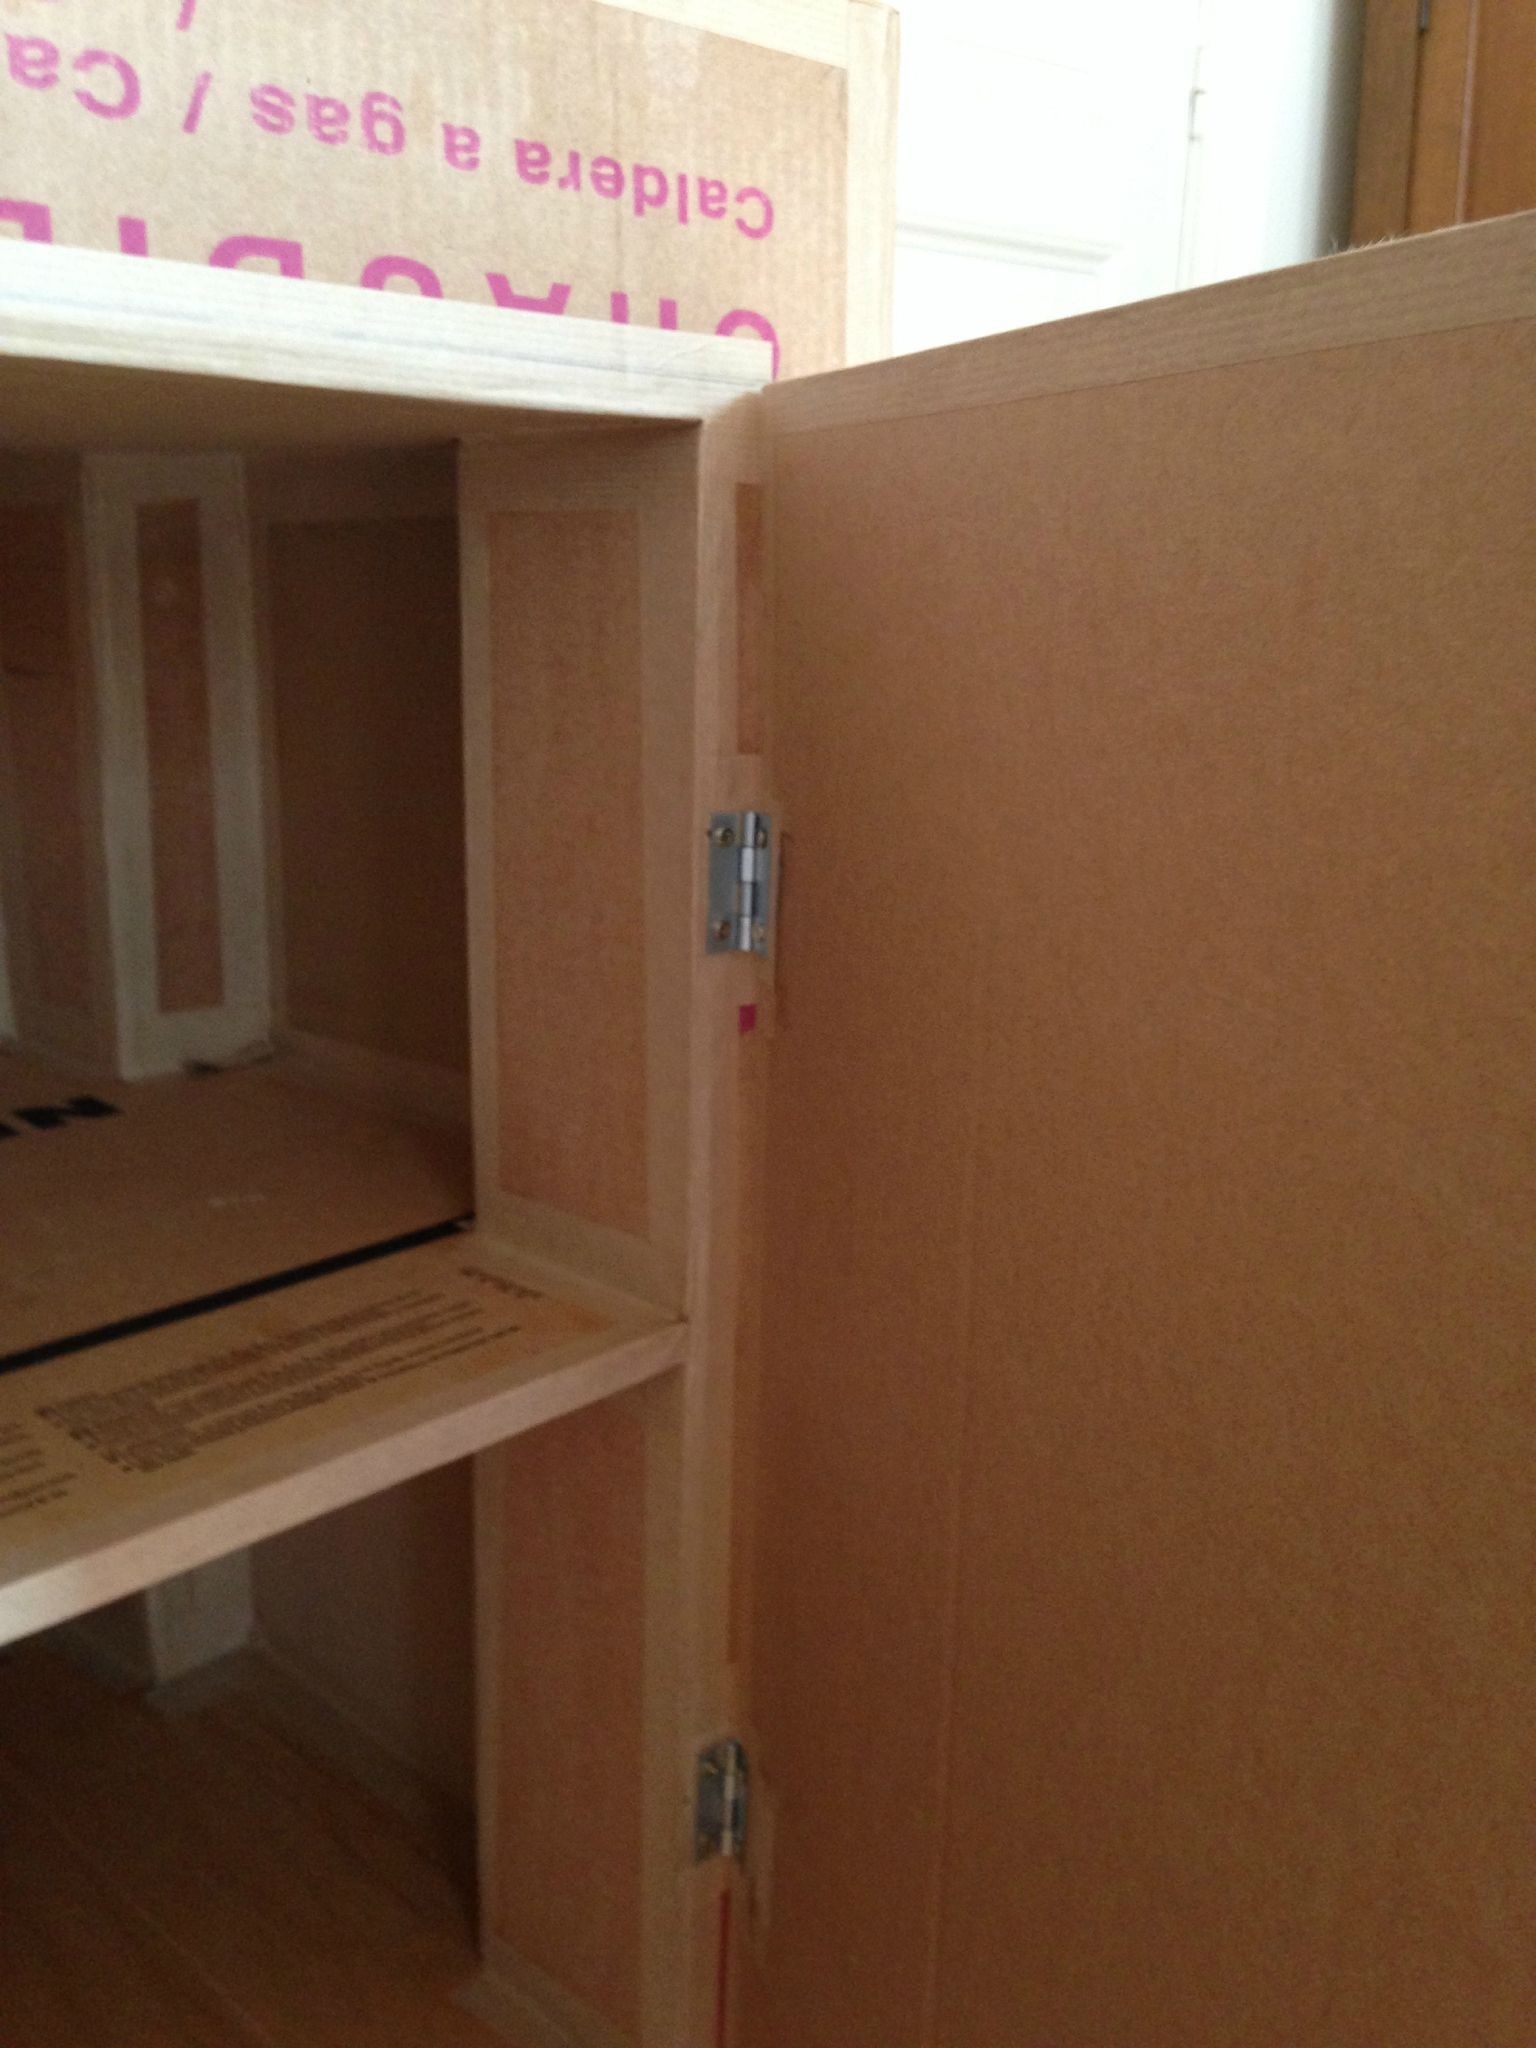 charnière porte sur meuble en carton | carton | pinterest | meuble